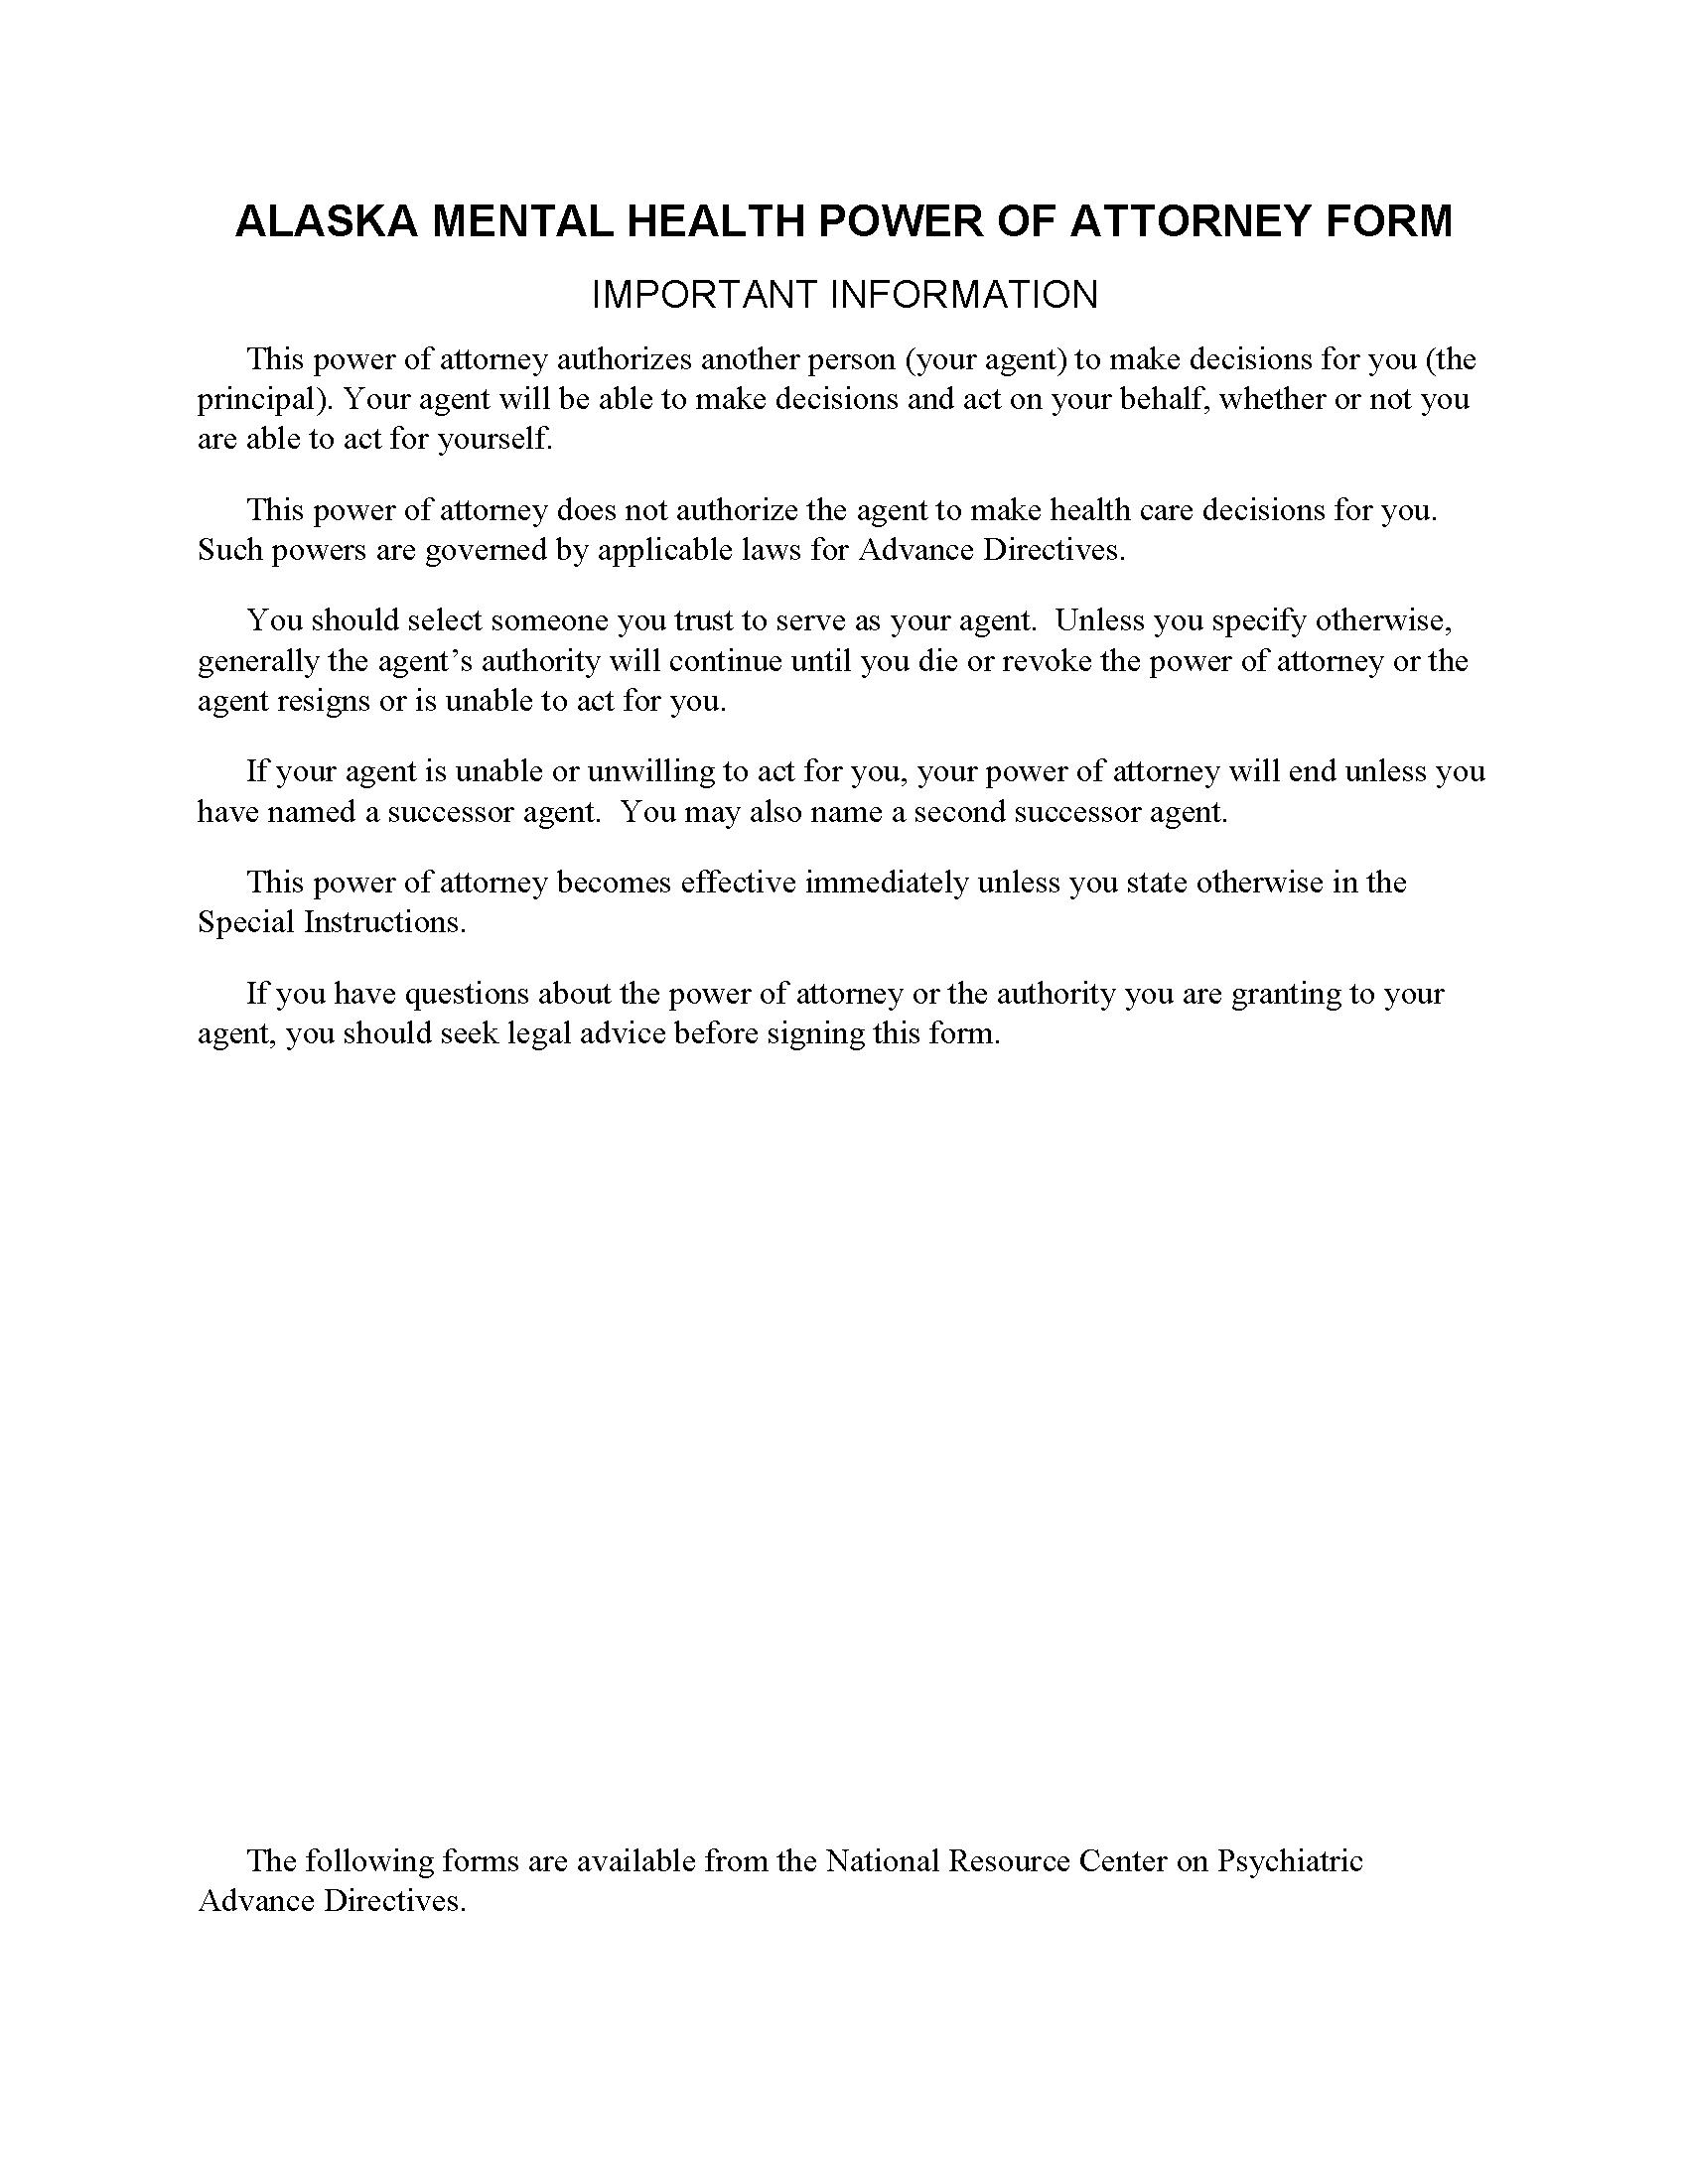 Alaska Mental Health Power of Attorney